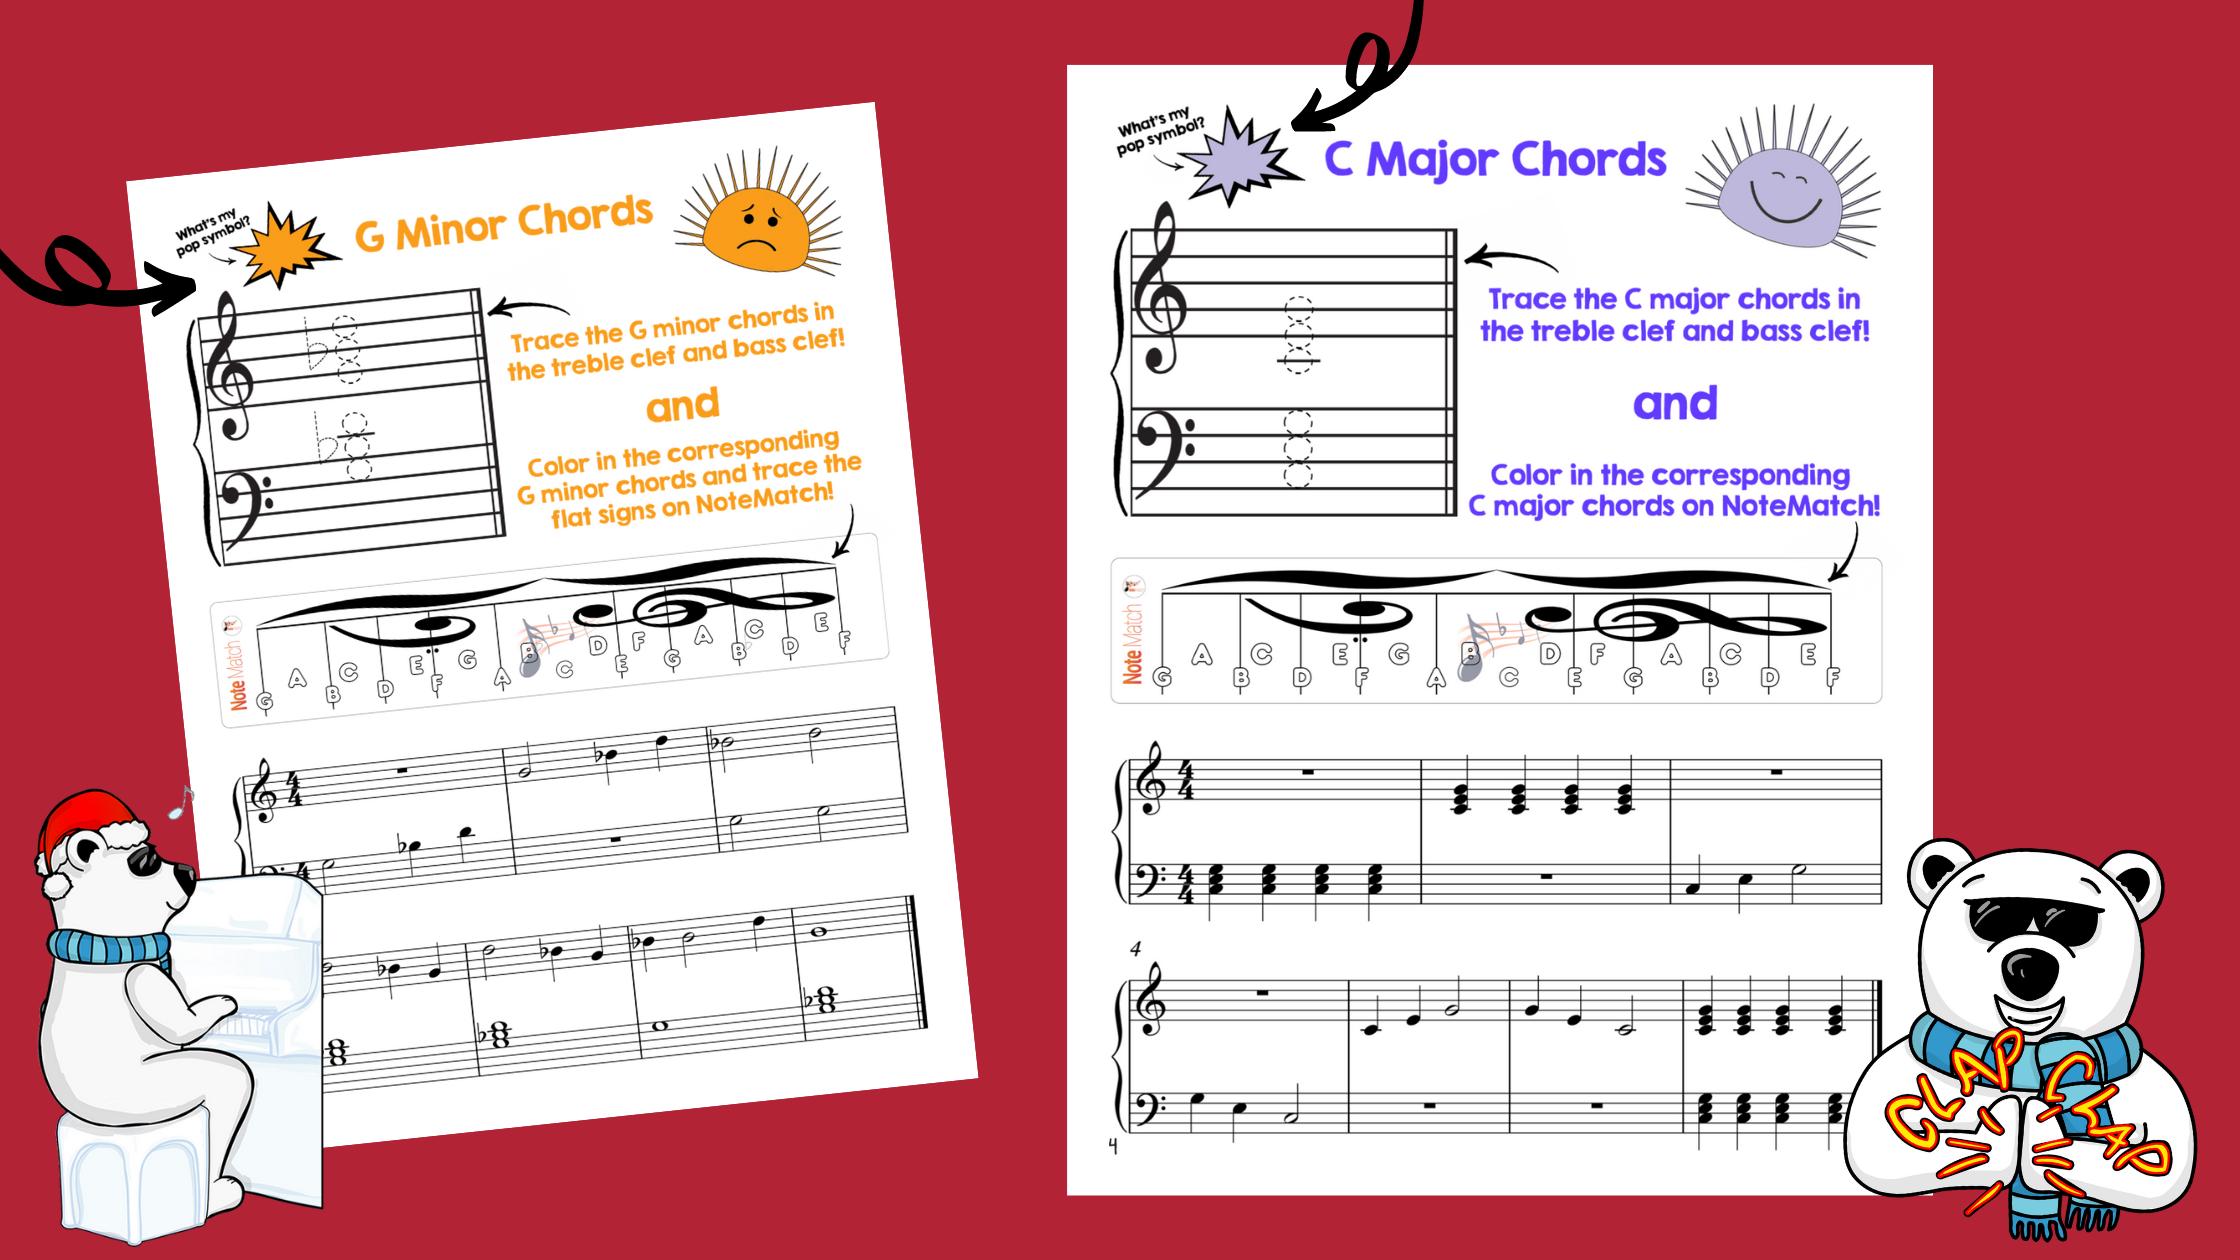 G minor chords and c major chords worksheets